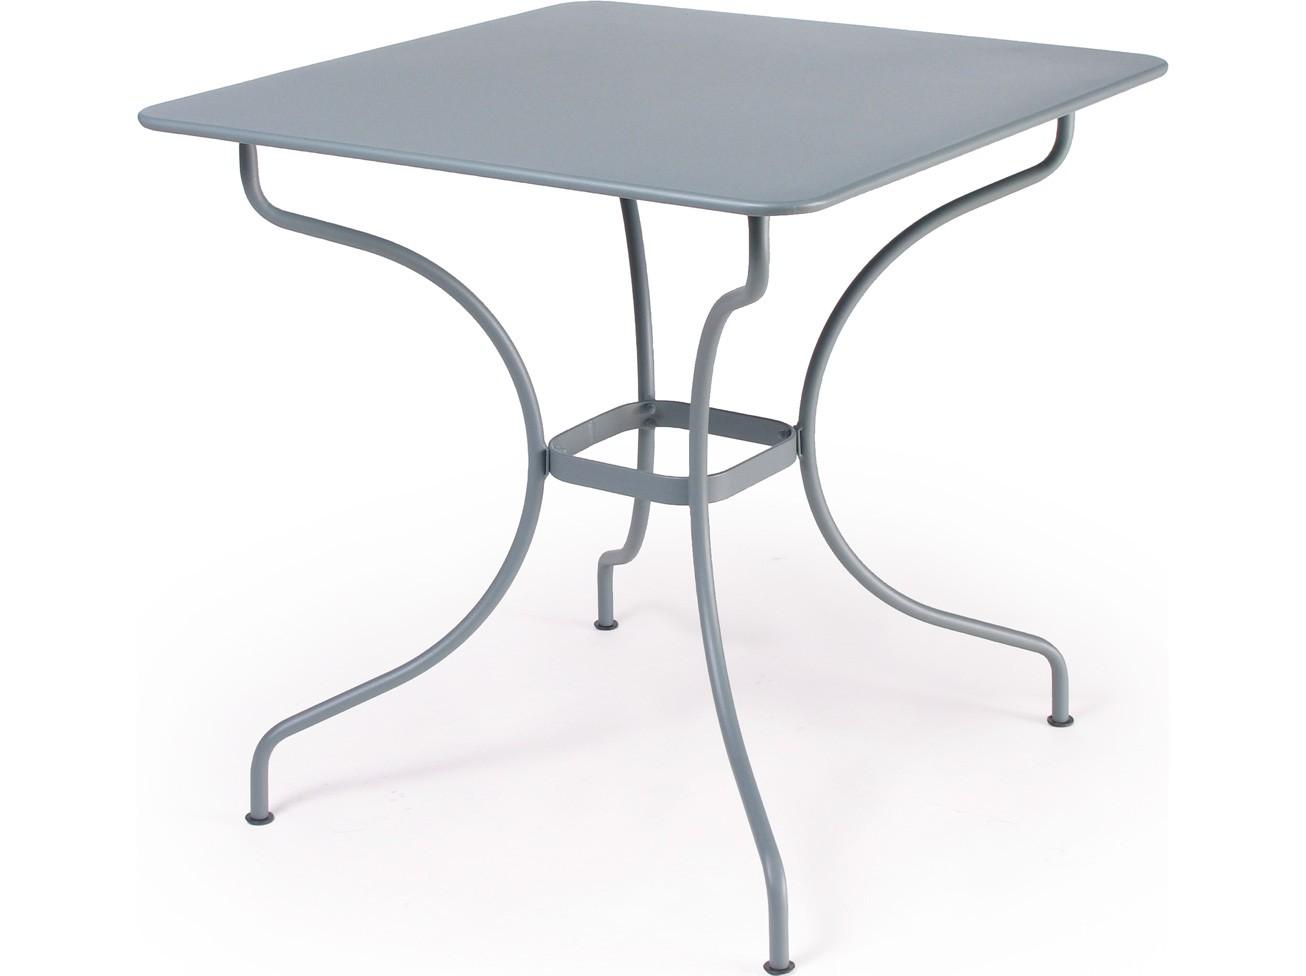 Table carr e op ra de fermob gris orage - Fermob opera table ...